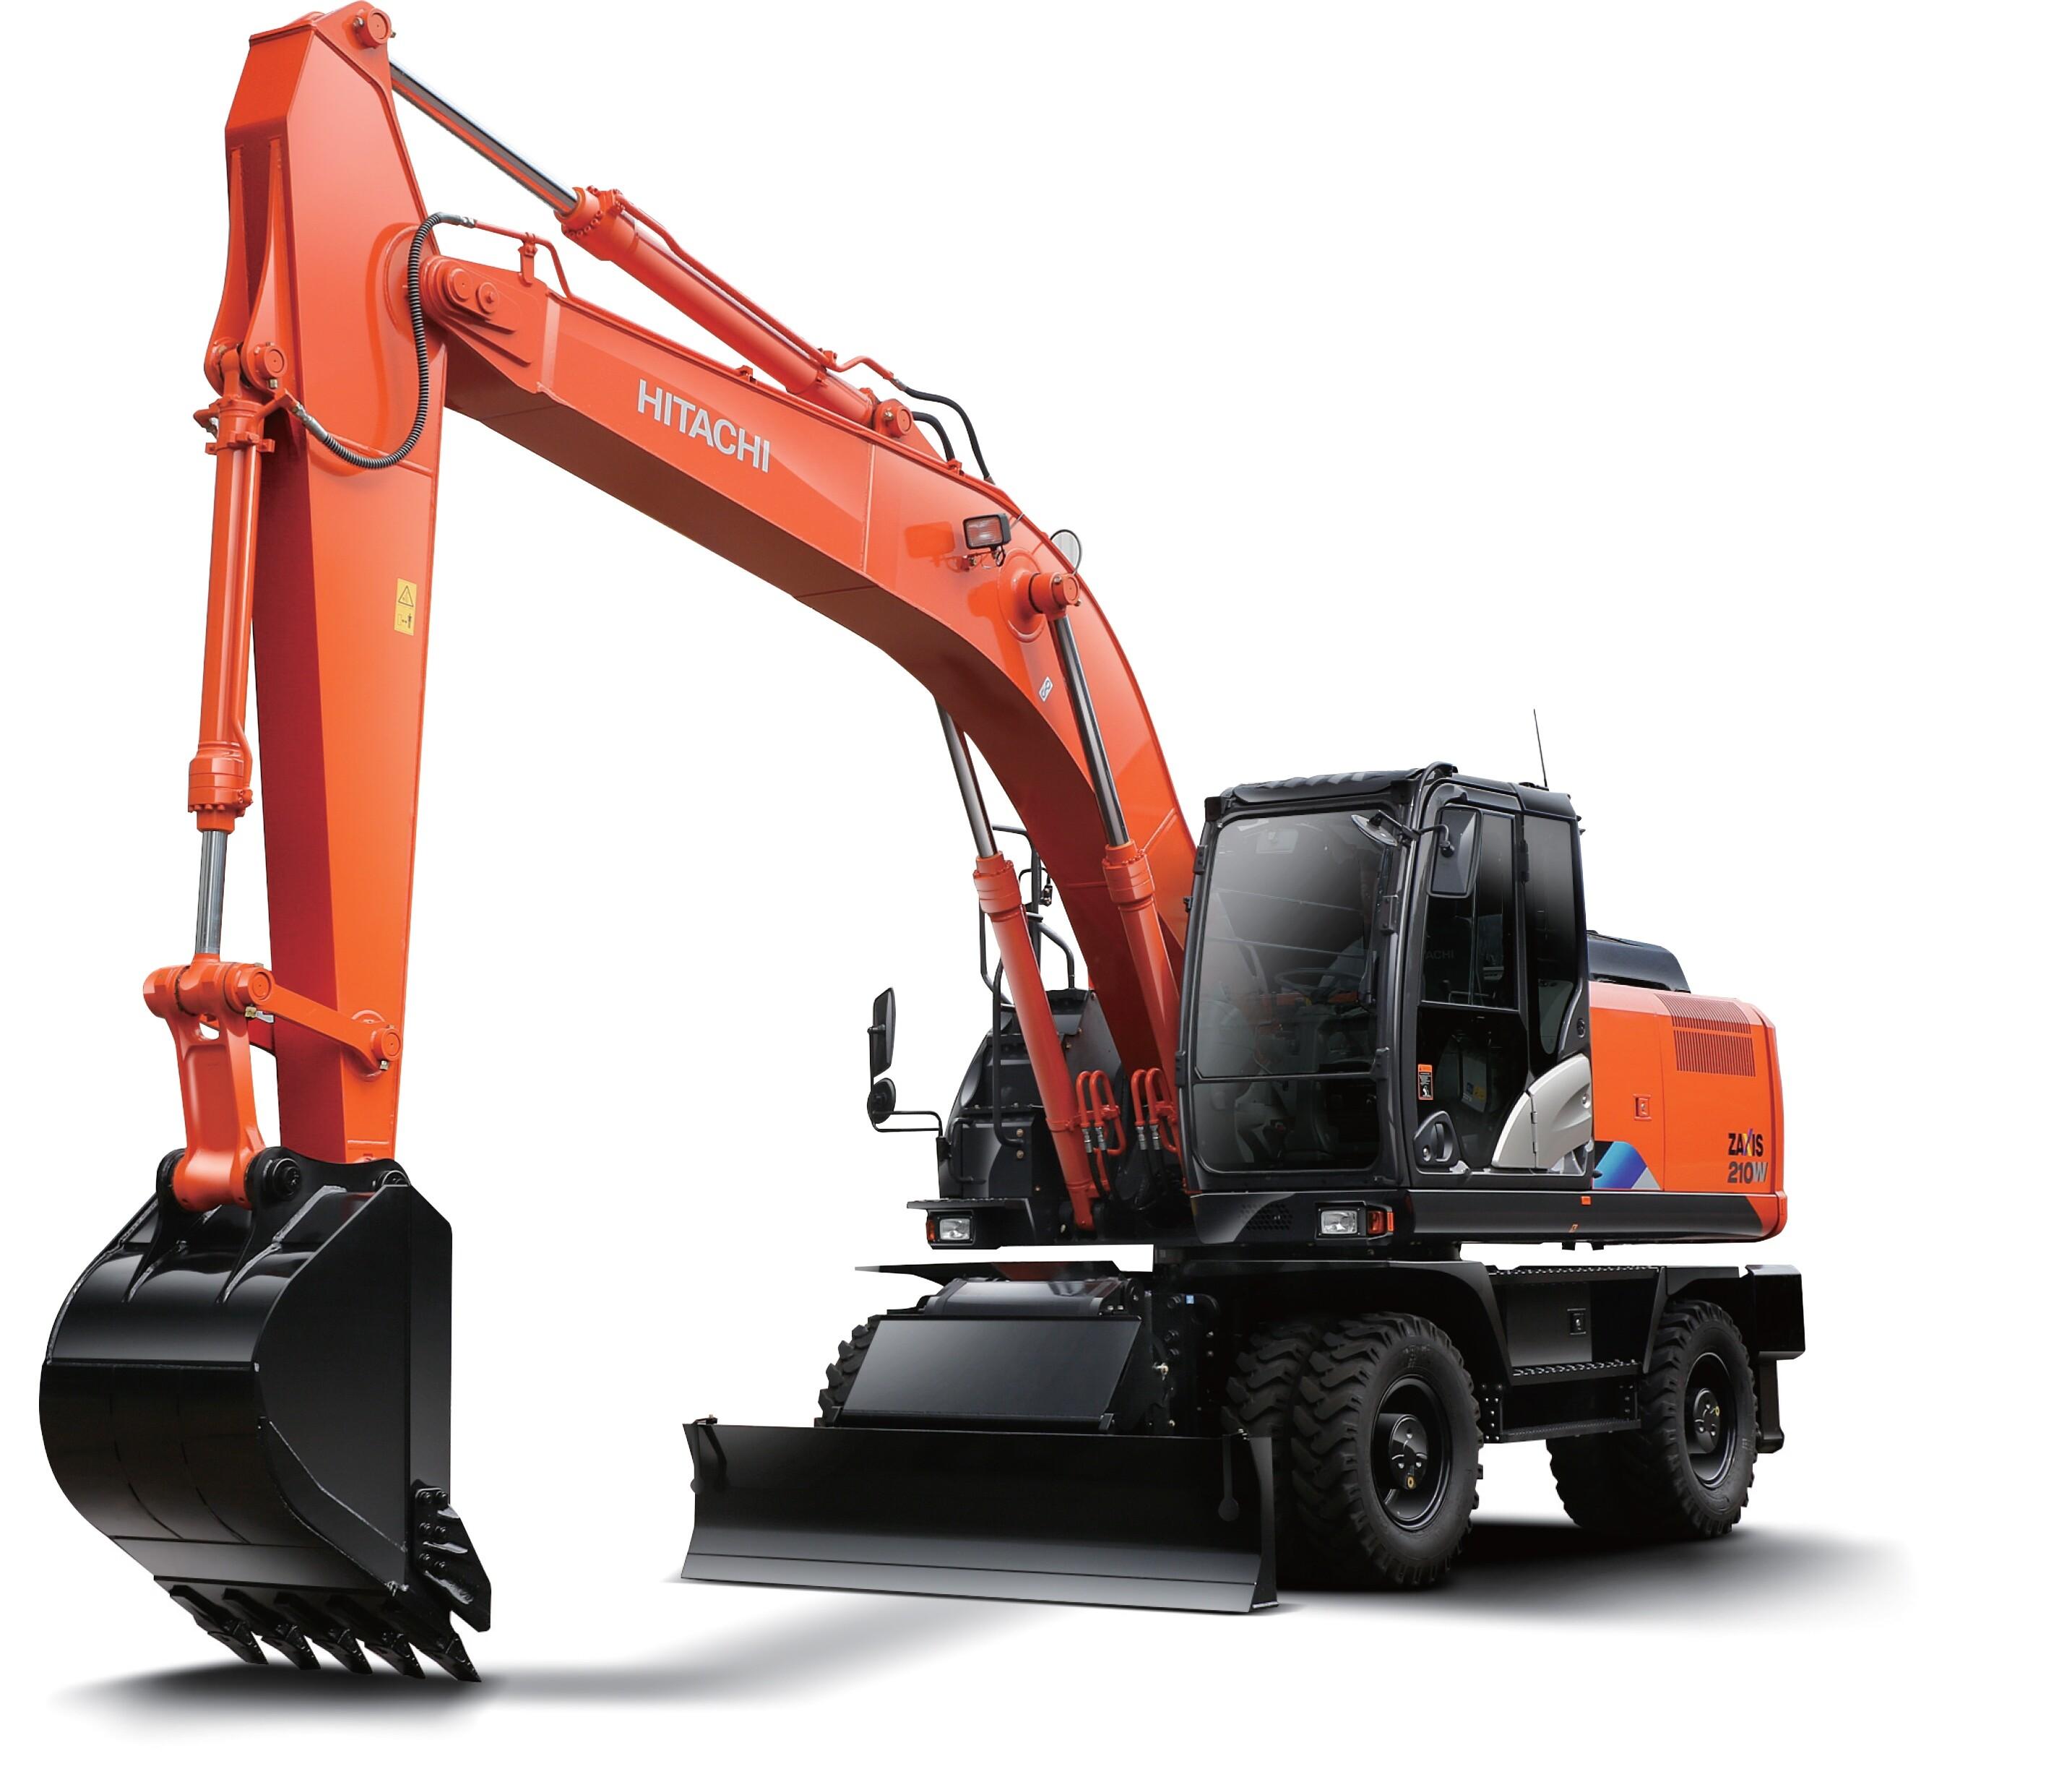 20 Tonne Wheeled Excavator